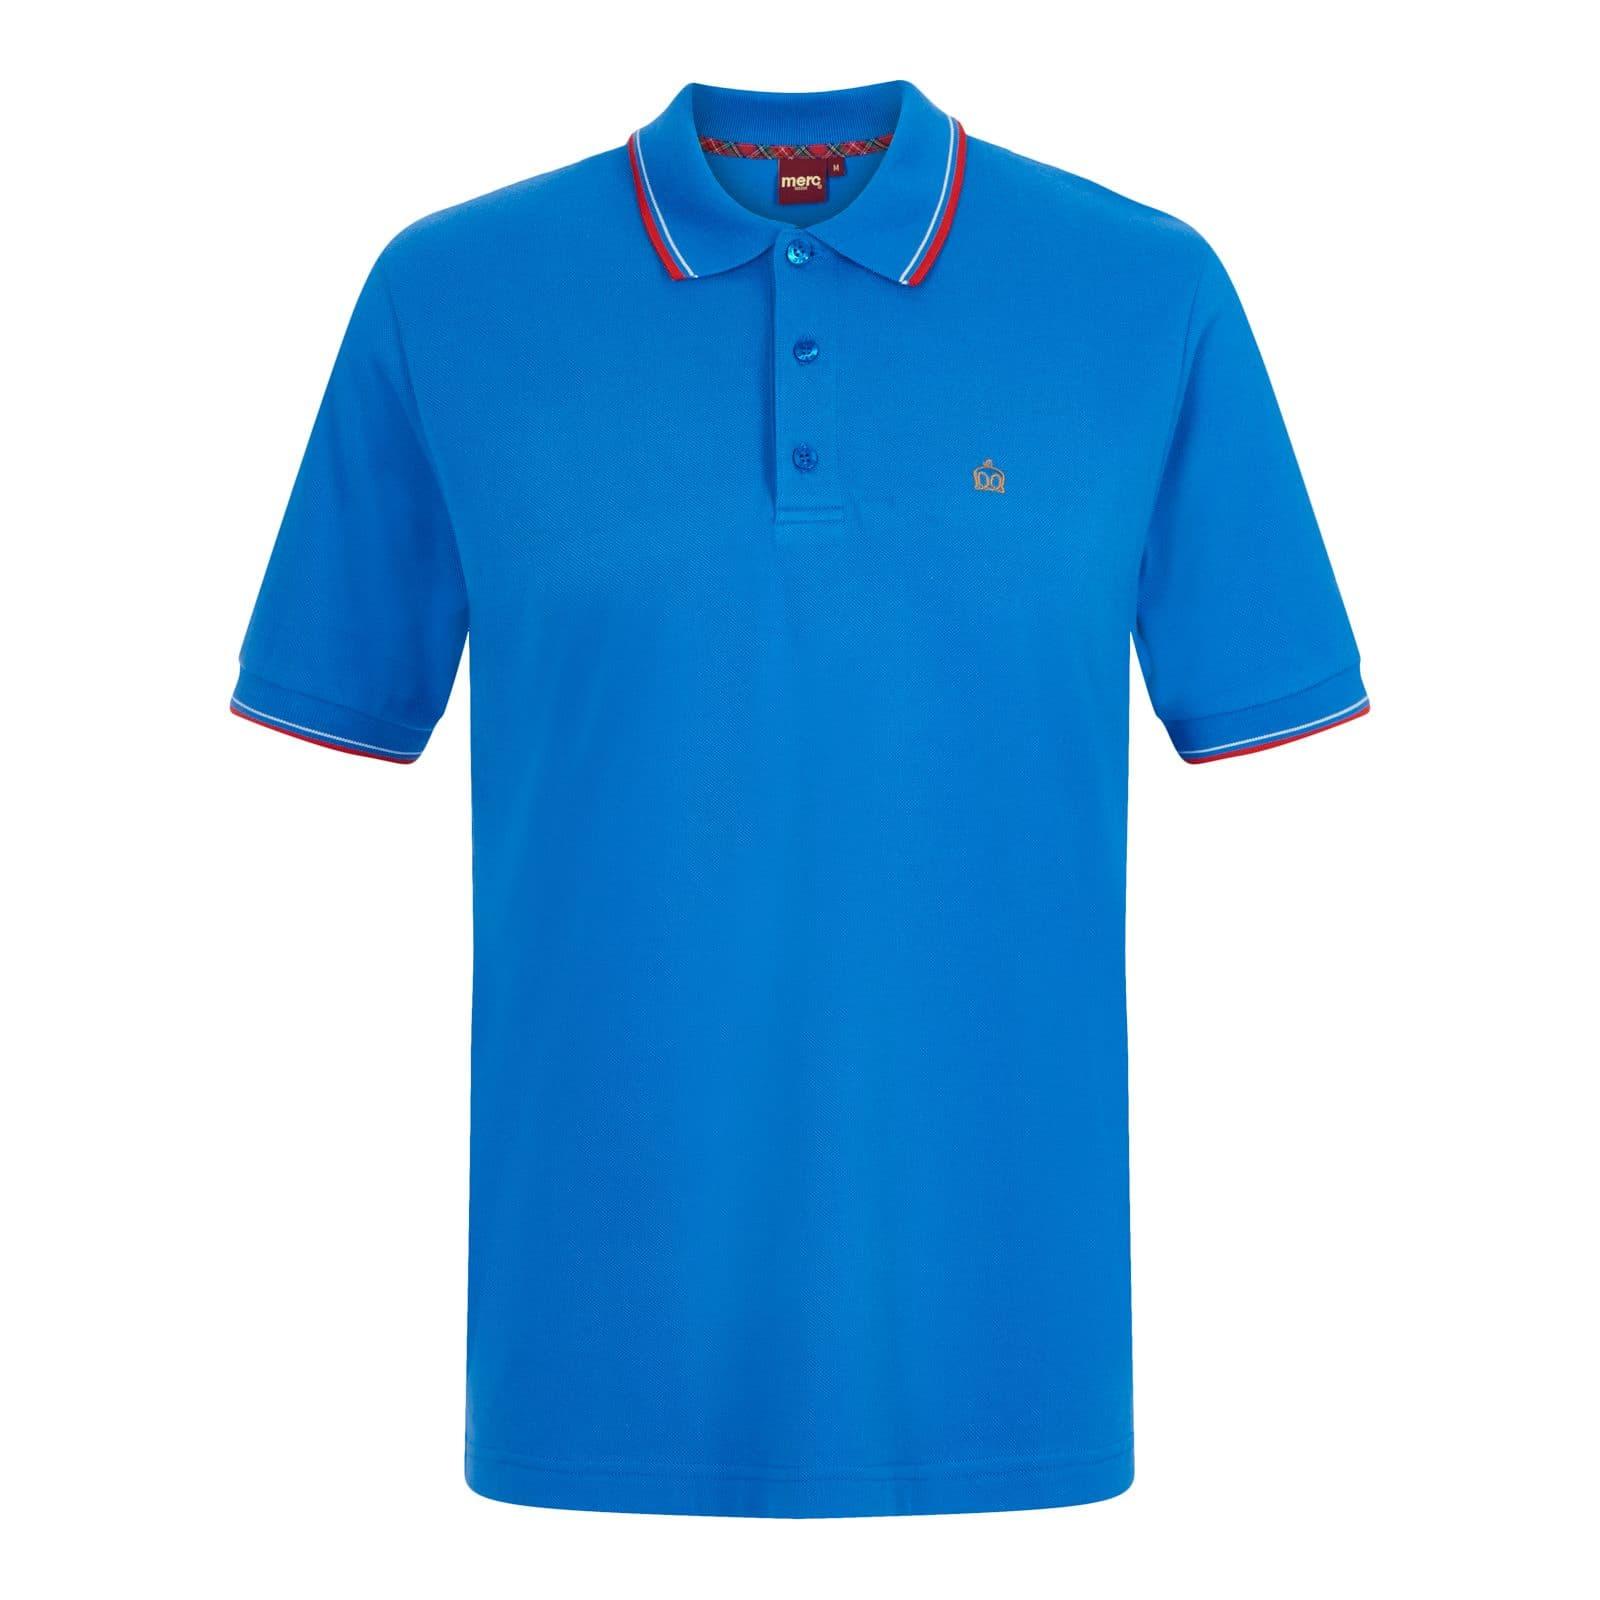 Рубашка Поло CardПоло под заказ<br><br><br>Артикул: 1906203<br>Материал: 100% хлопок<br>Цвет: лазурный<br>Пол: Мужской